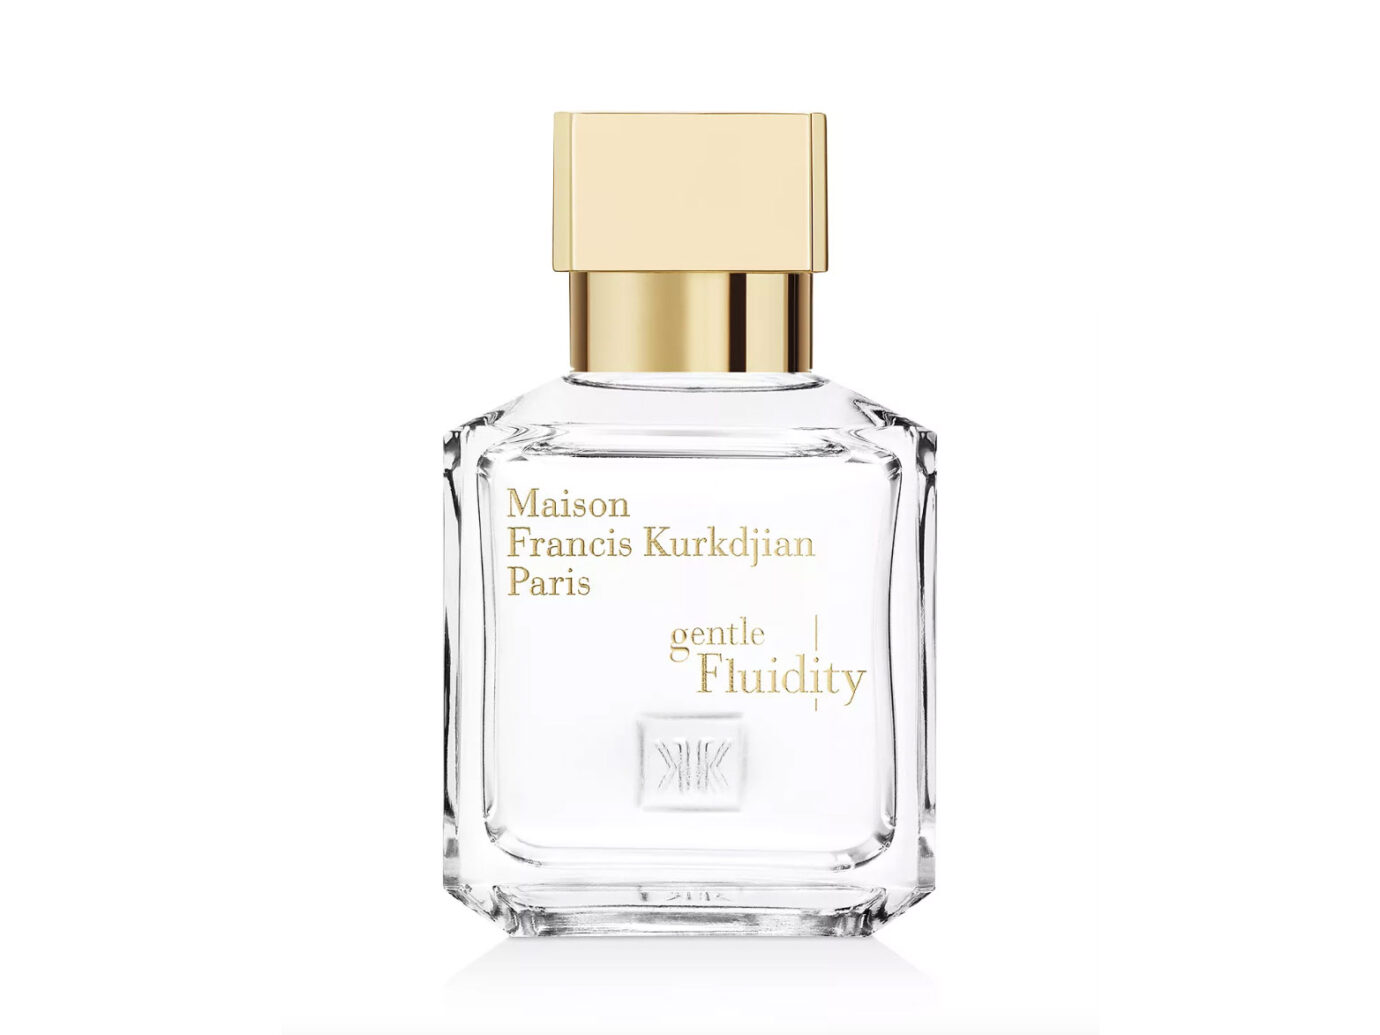 Maison Francis Kurkdjian Gentle Fluidity Gold Eau de Parfum